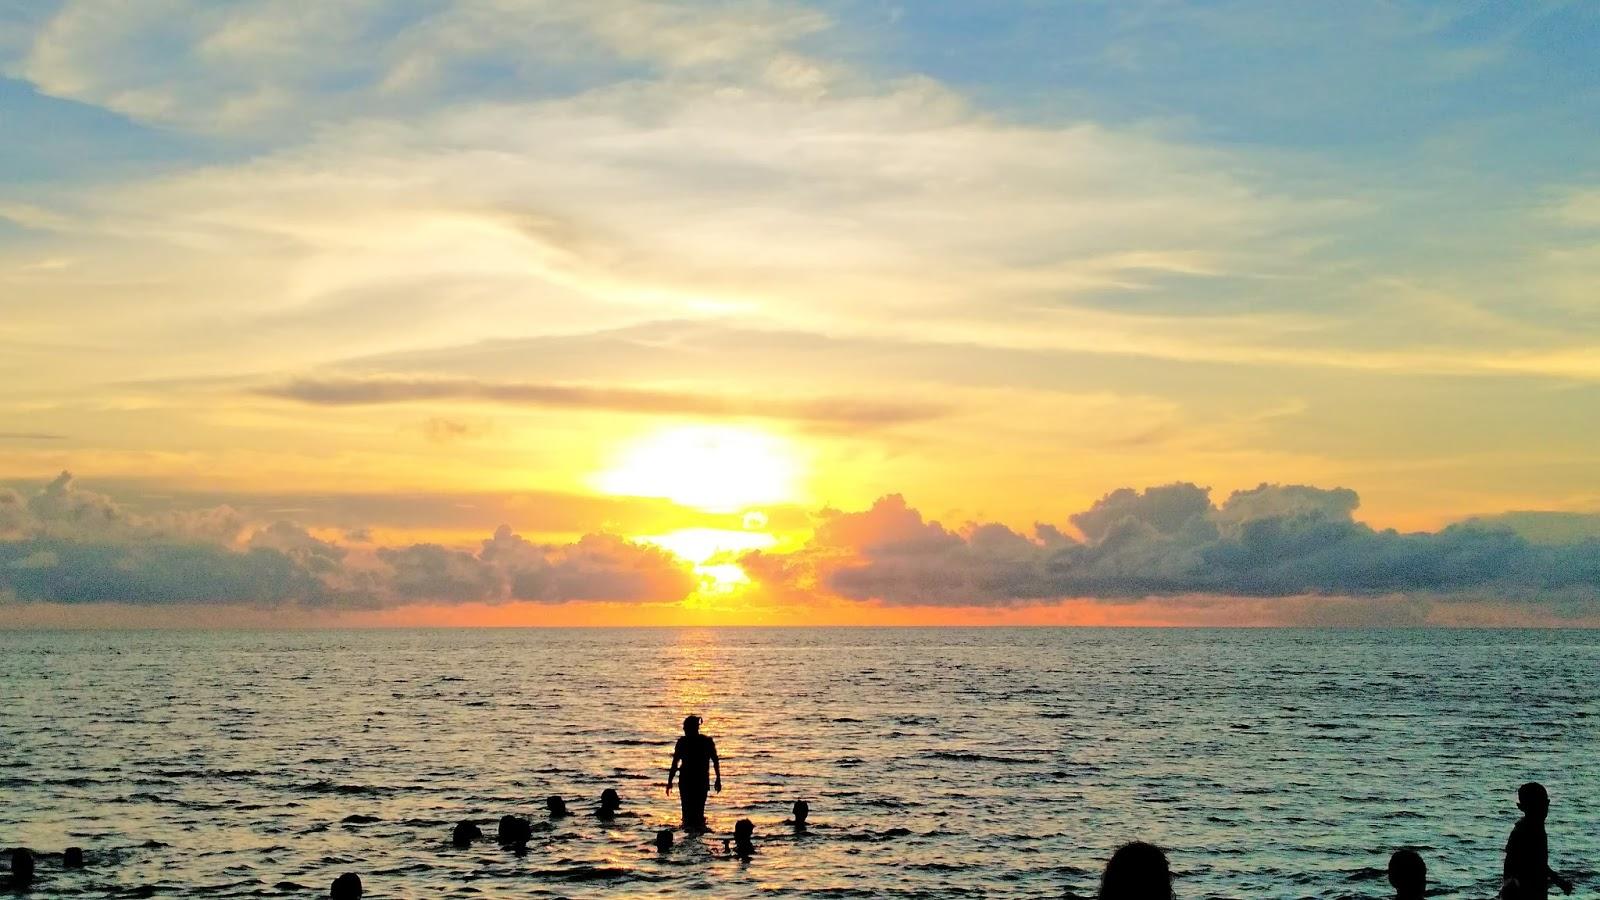 Objek Wisata Pertama Datangi Ternate Pantai Kastela Kota